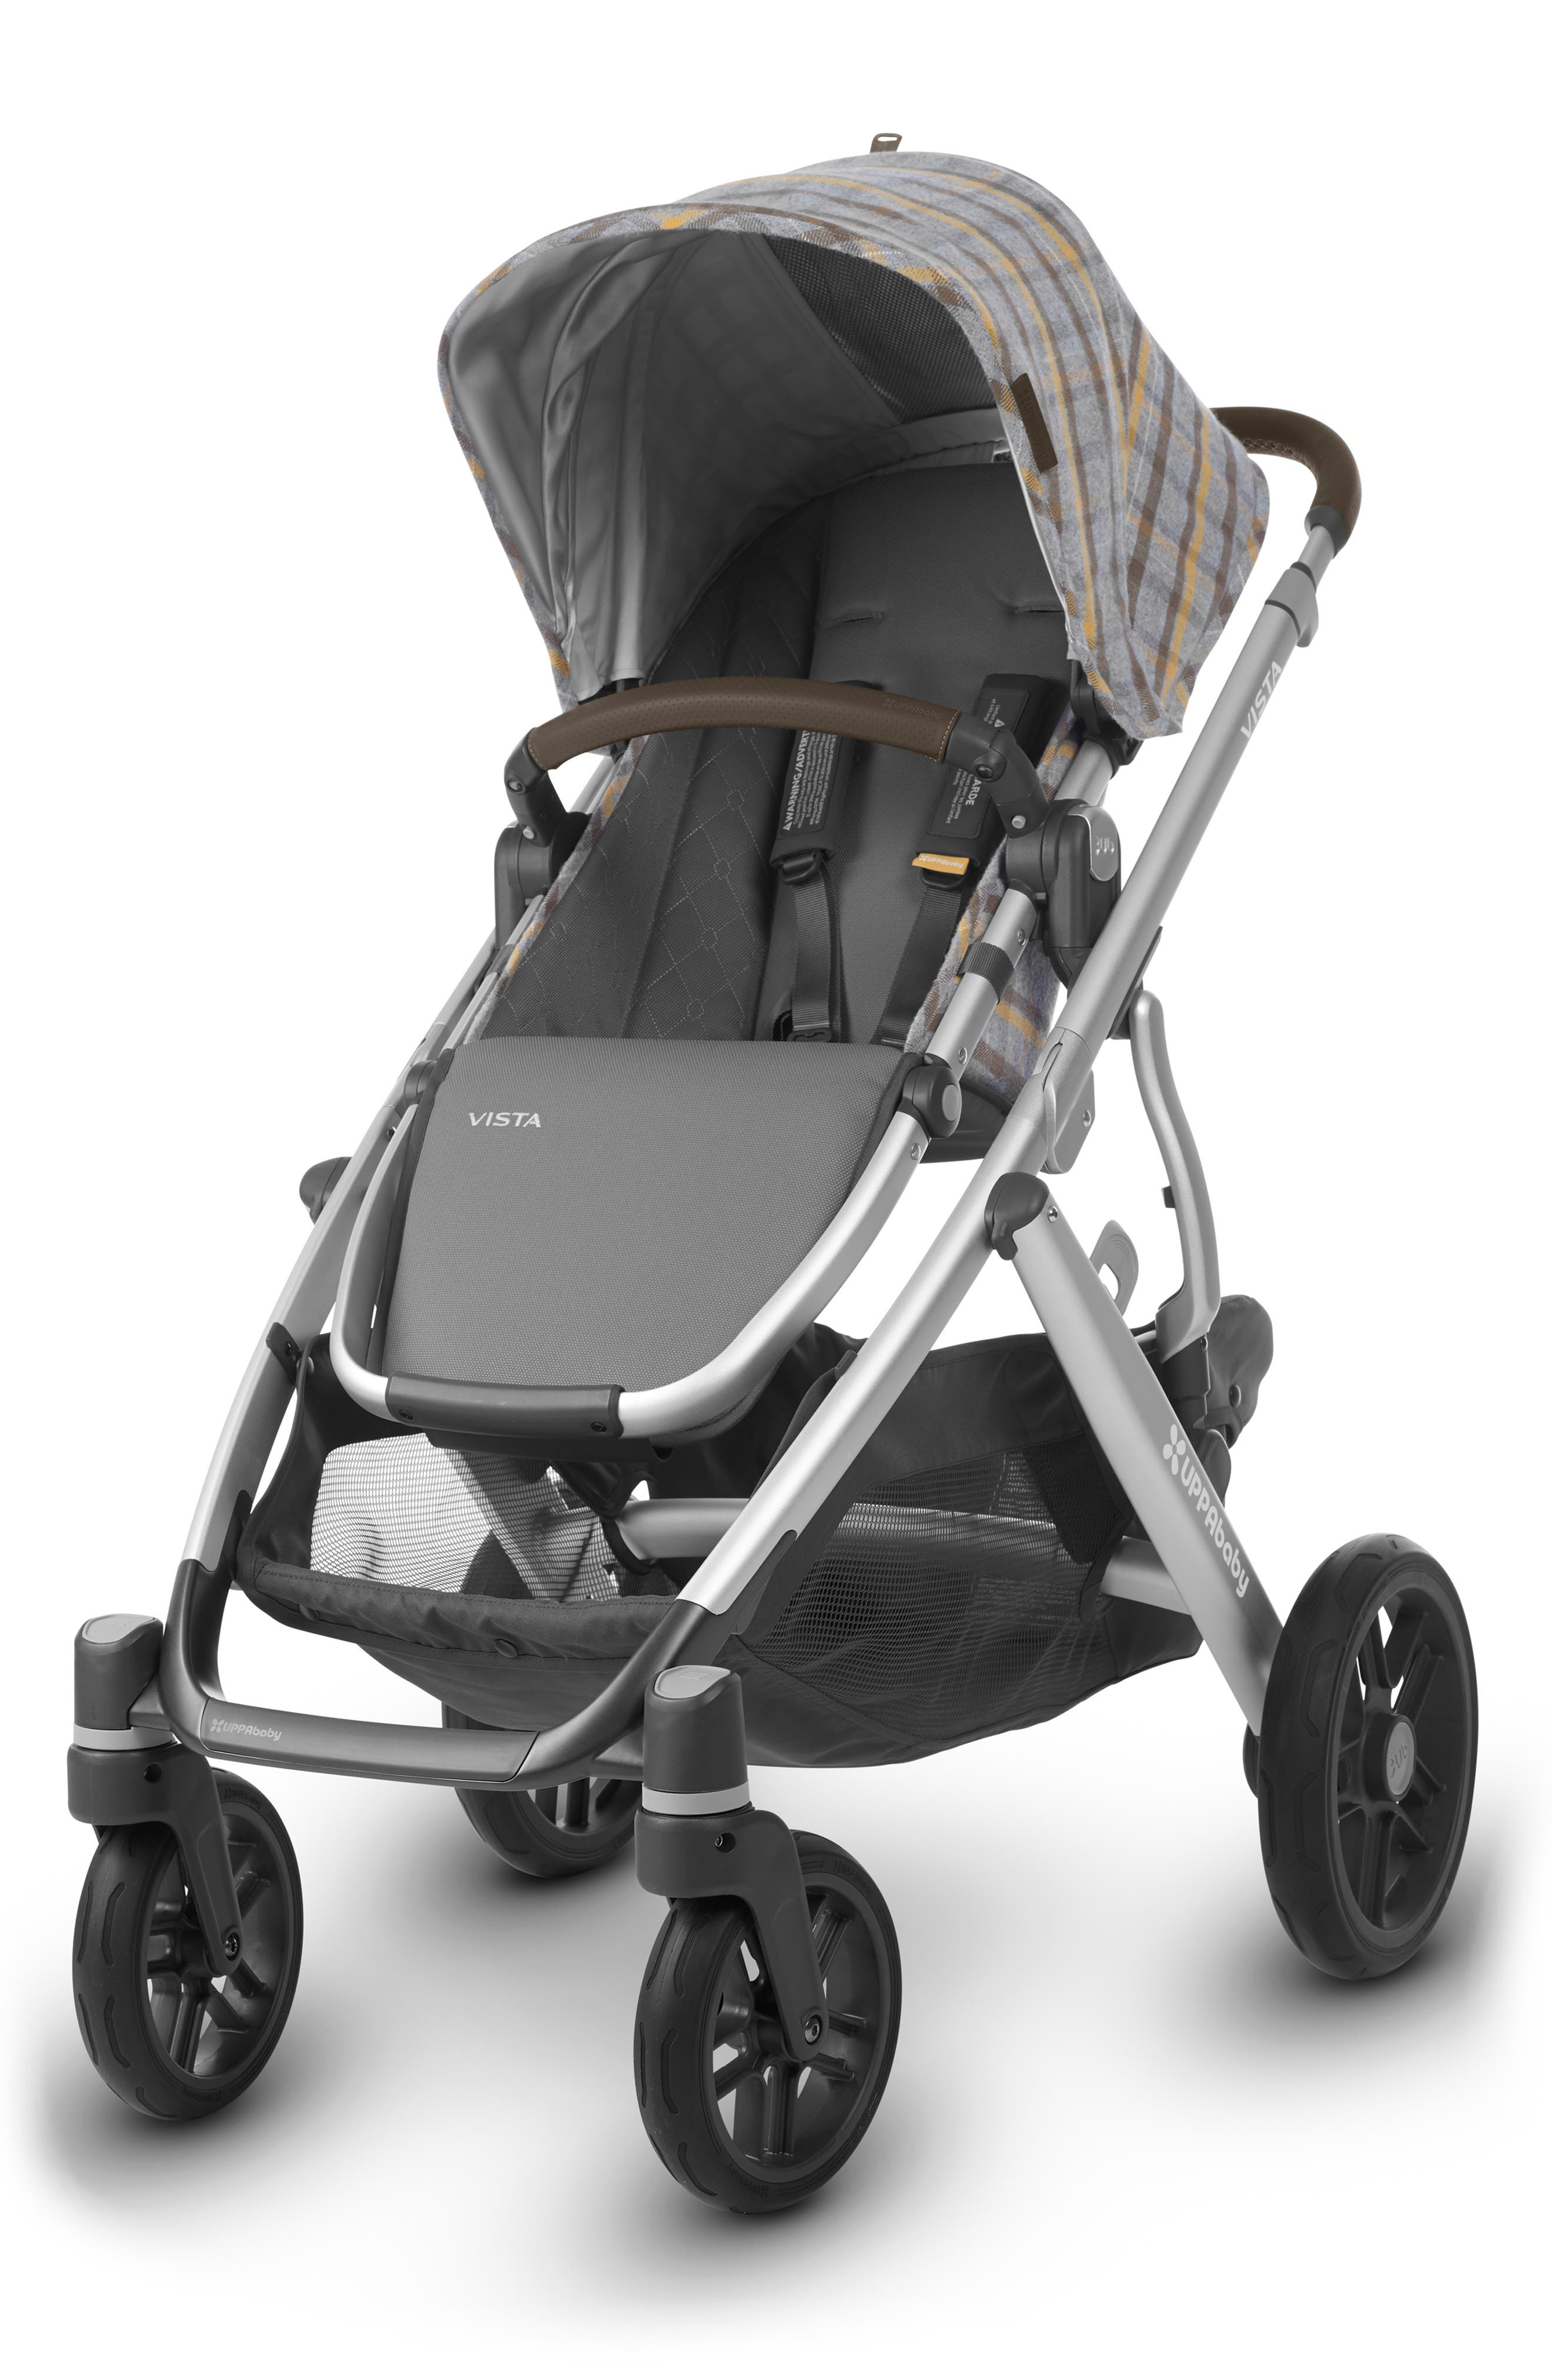 VISTA Spenser Convertible Stroller with Bassinet & Toddler Seat,                             Alternate thumbnail 4, color,                             GREY/ YELLOW TARTAN